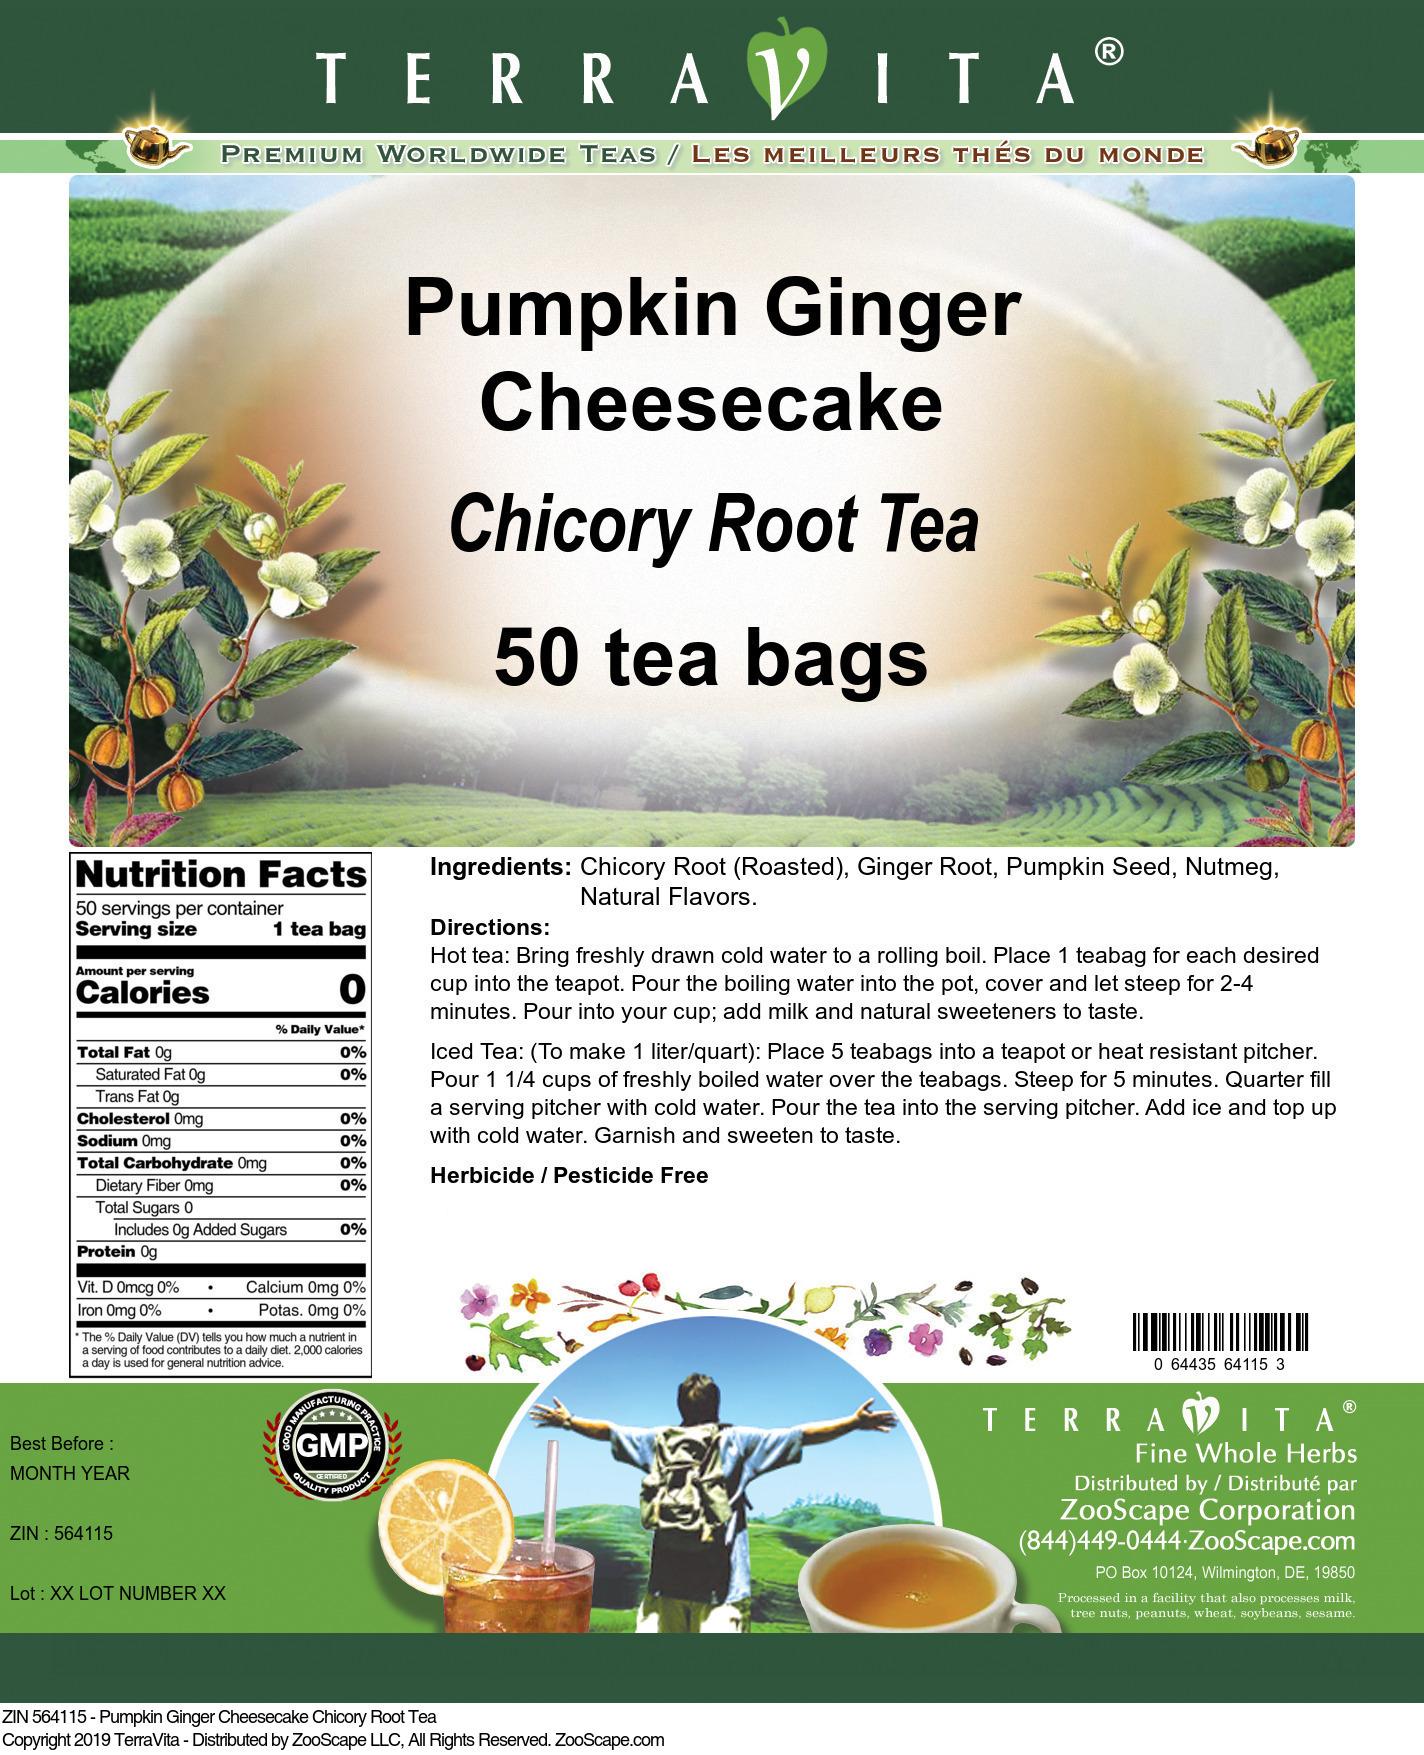 Pumpkin Ginger Cheesecake Chicory Root Tea